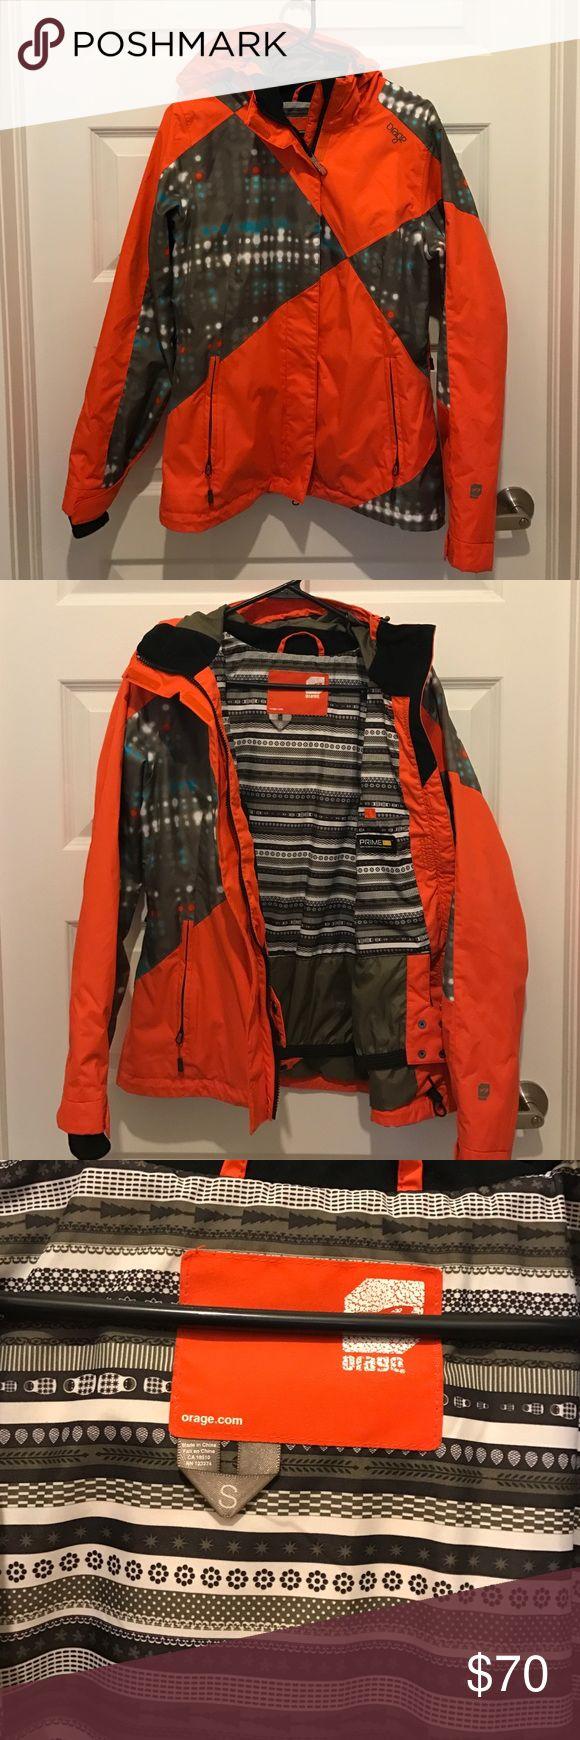 Orage ski/snowboard jacket size S Orage ski/snowboard jacket. Size S. only worn once. Excellent condition! Smoke and pet free home. orage Jackets & Coats